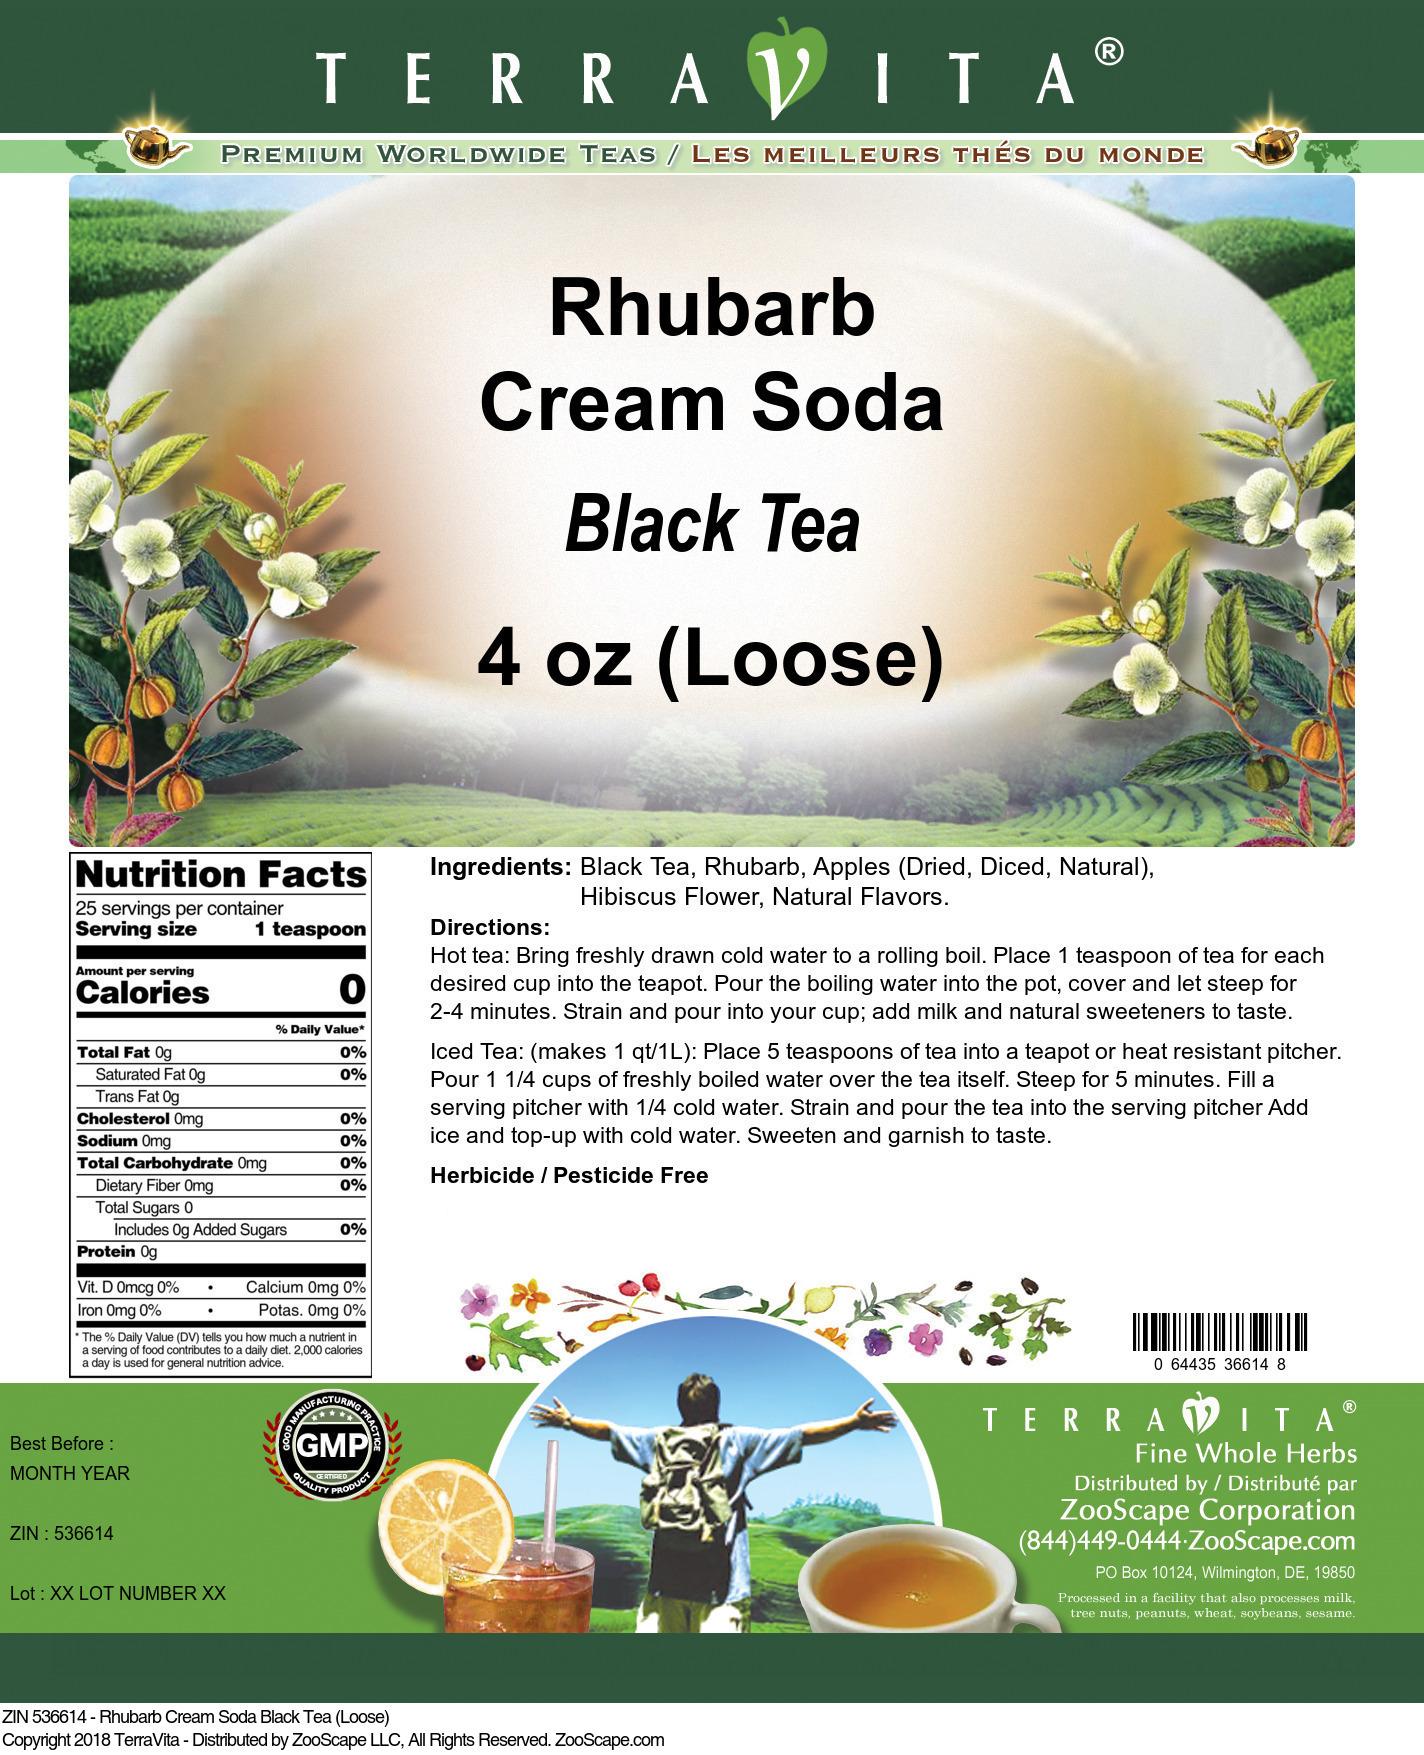 Rhubarb Cream Soda Black Tea